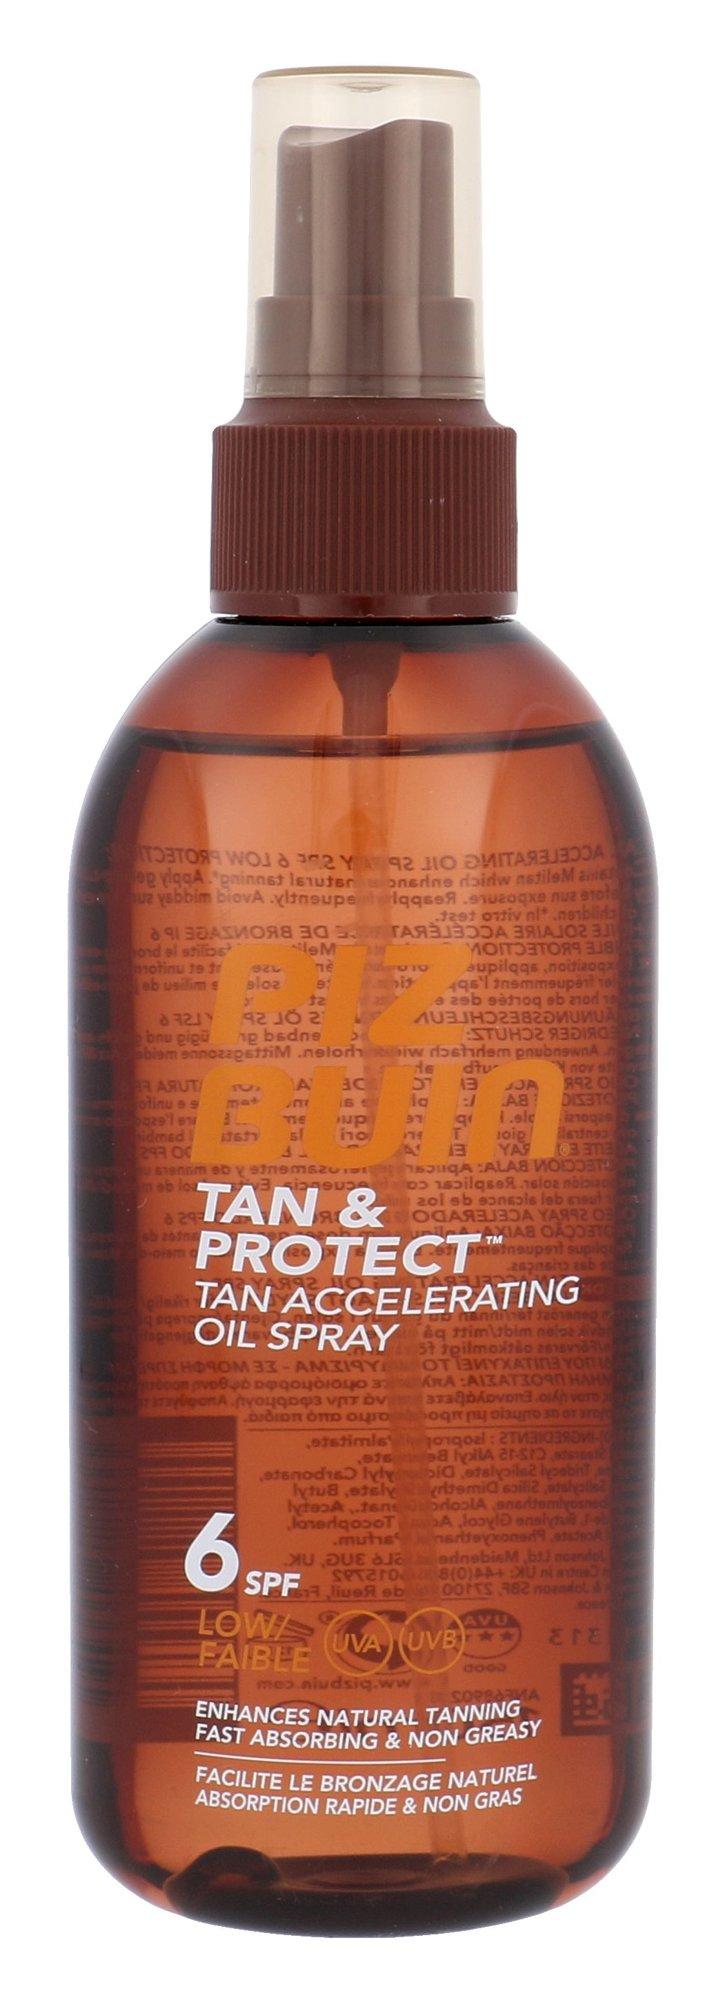 Apsaugai nuo saulės Piz Buin Tan & Protect Tan Accelerating Oil Spray SPF6